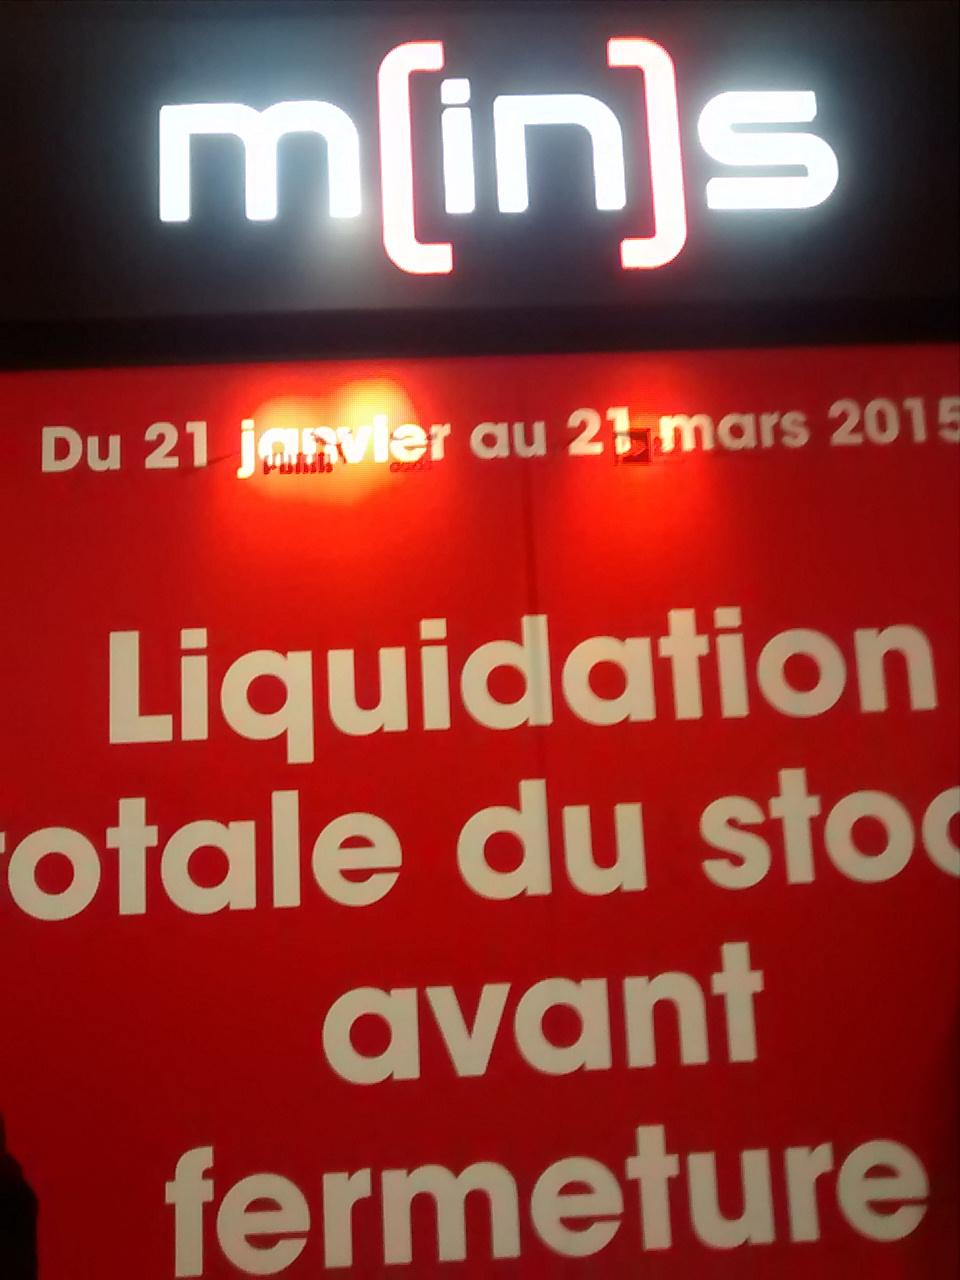 Liquidation Totale avant fermeture